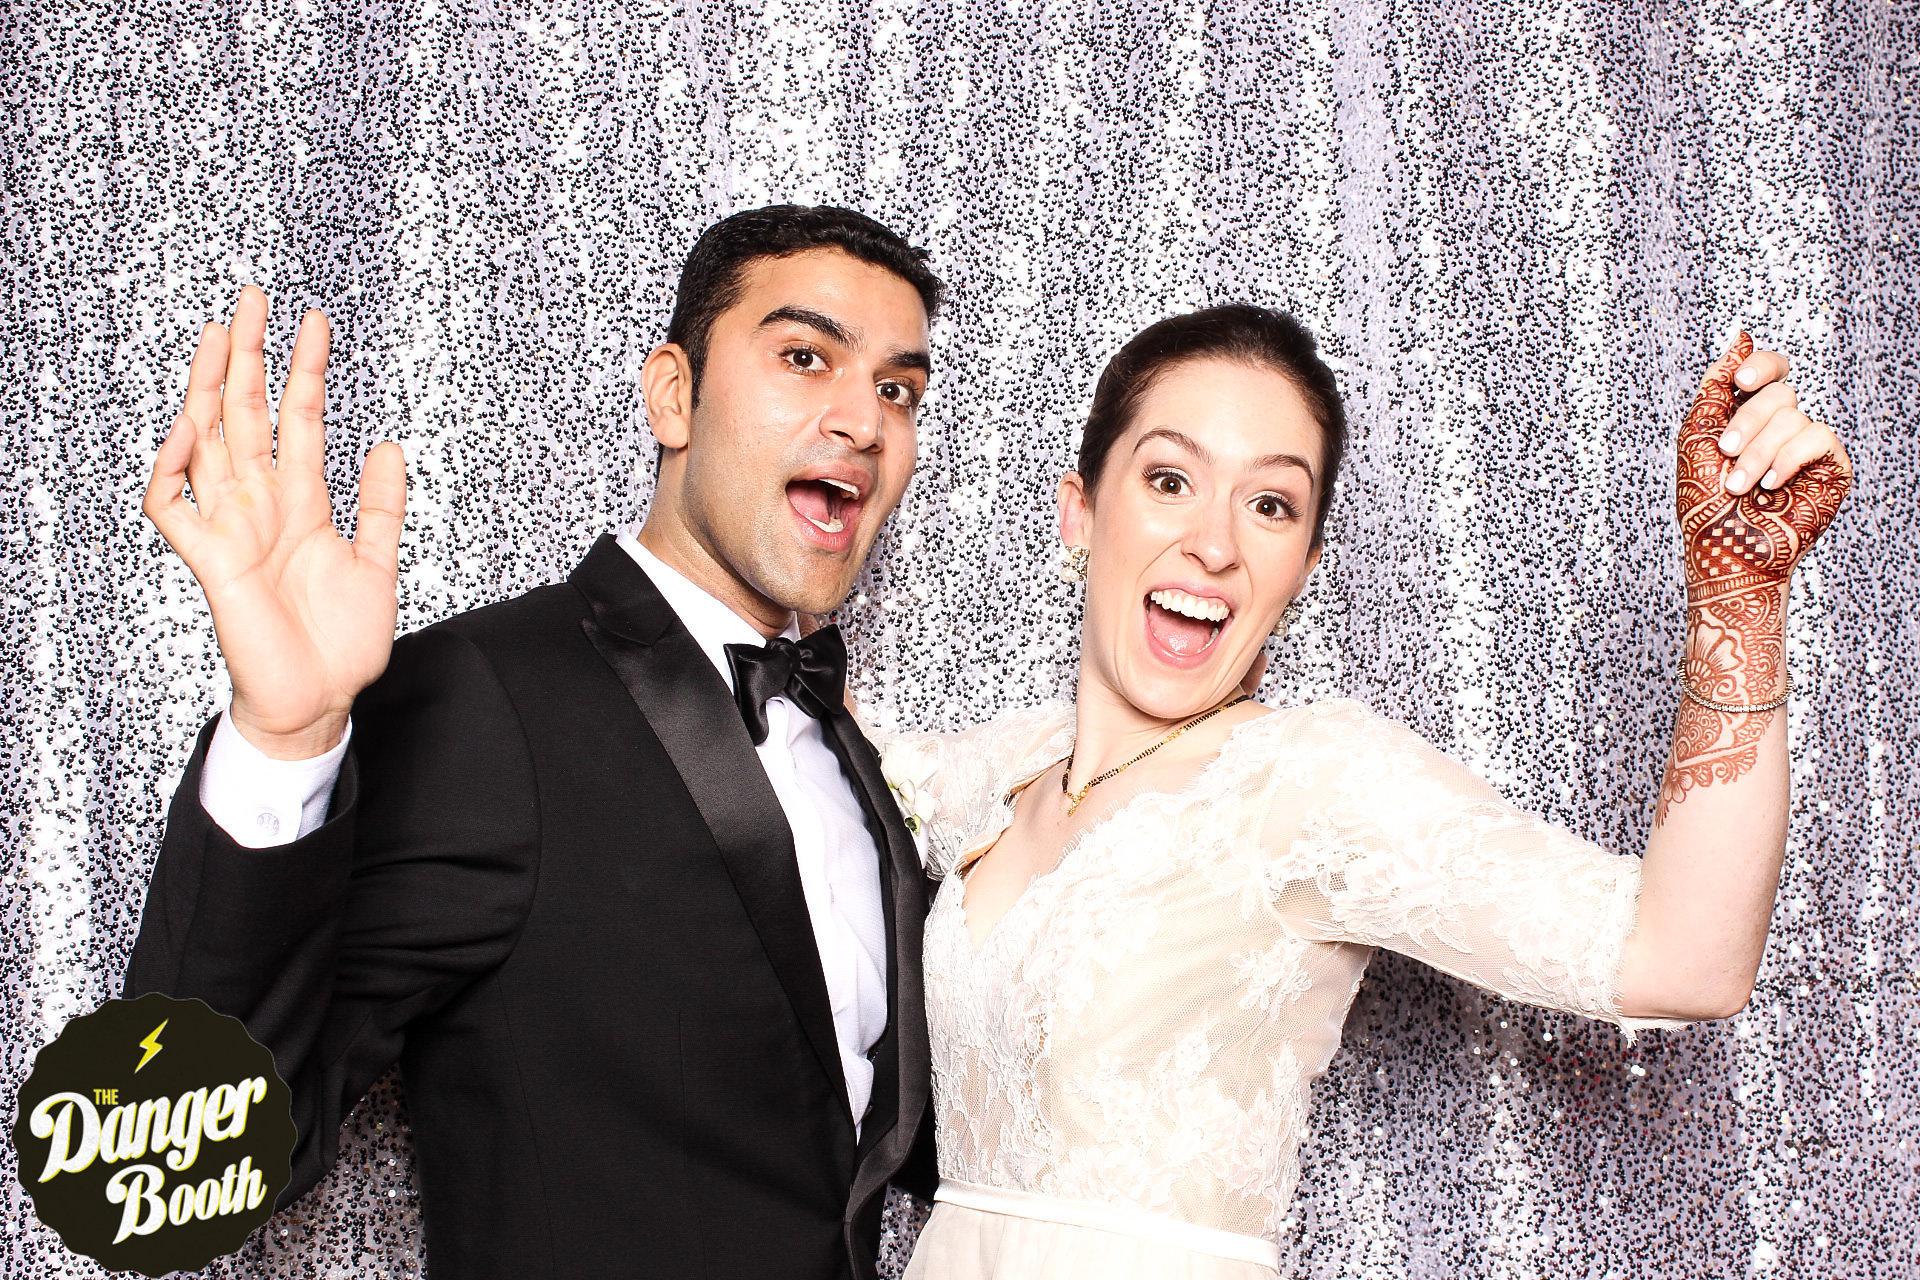 Wedding Photo Booth Boston | Open Air Photo Booth Boston | Best Photo Booth Boston